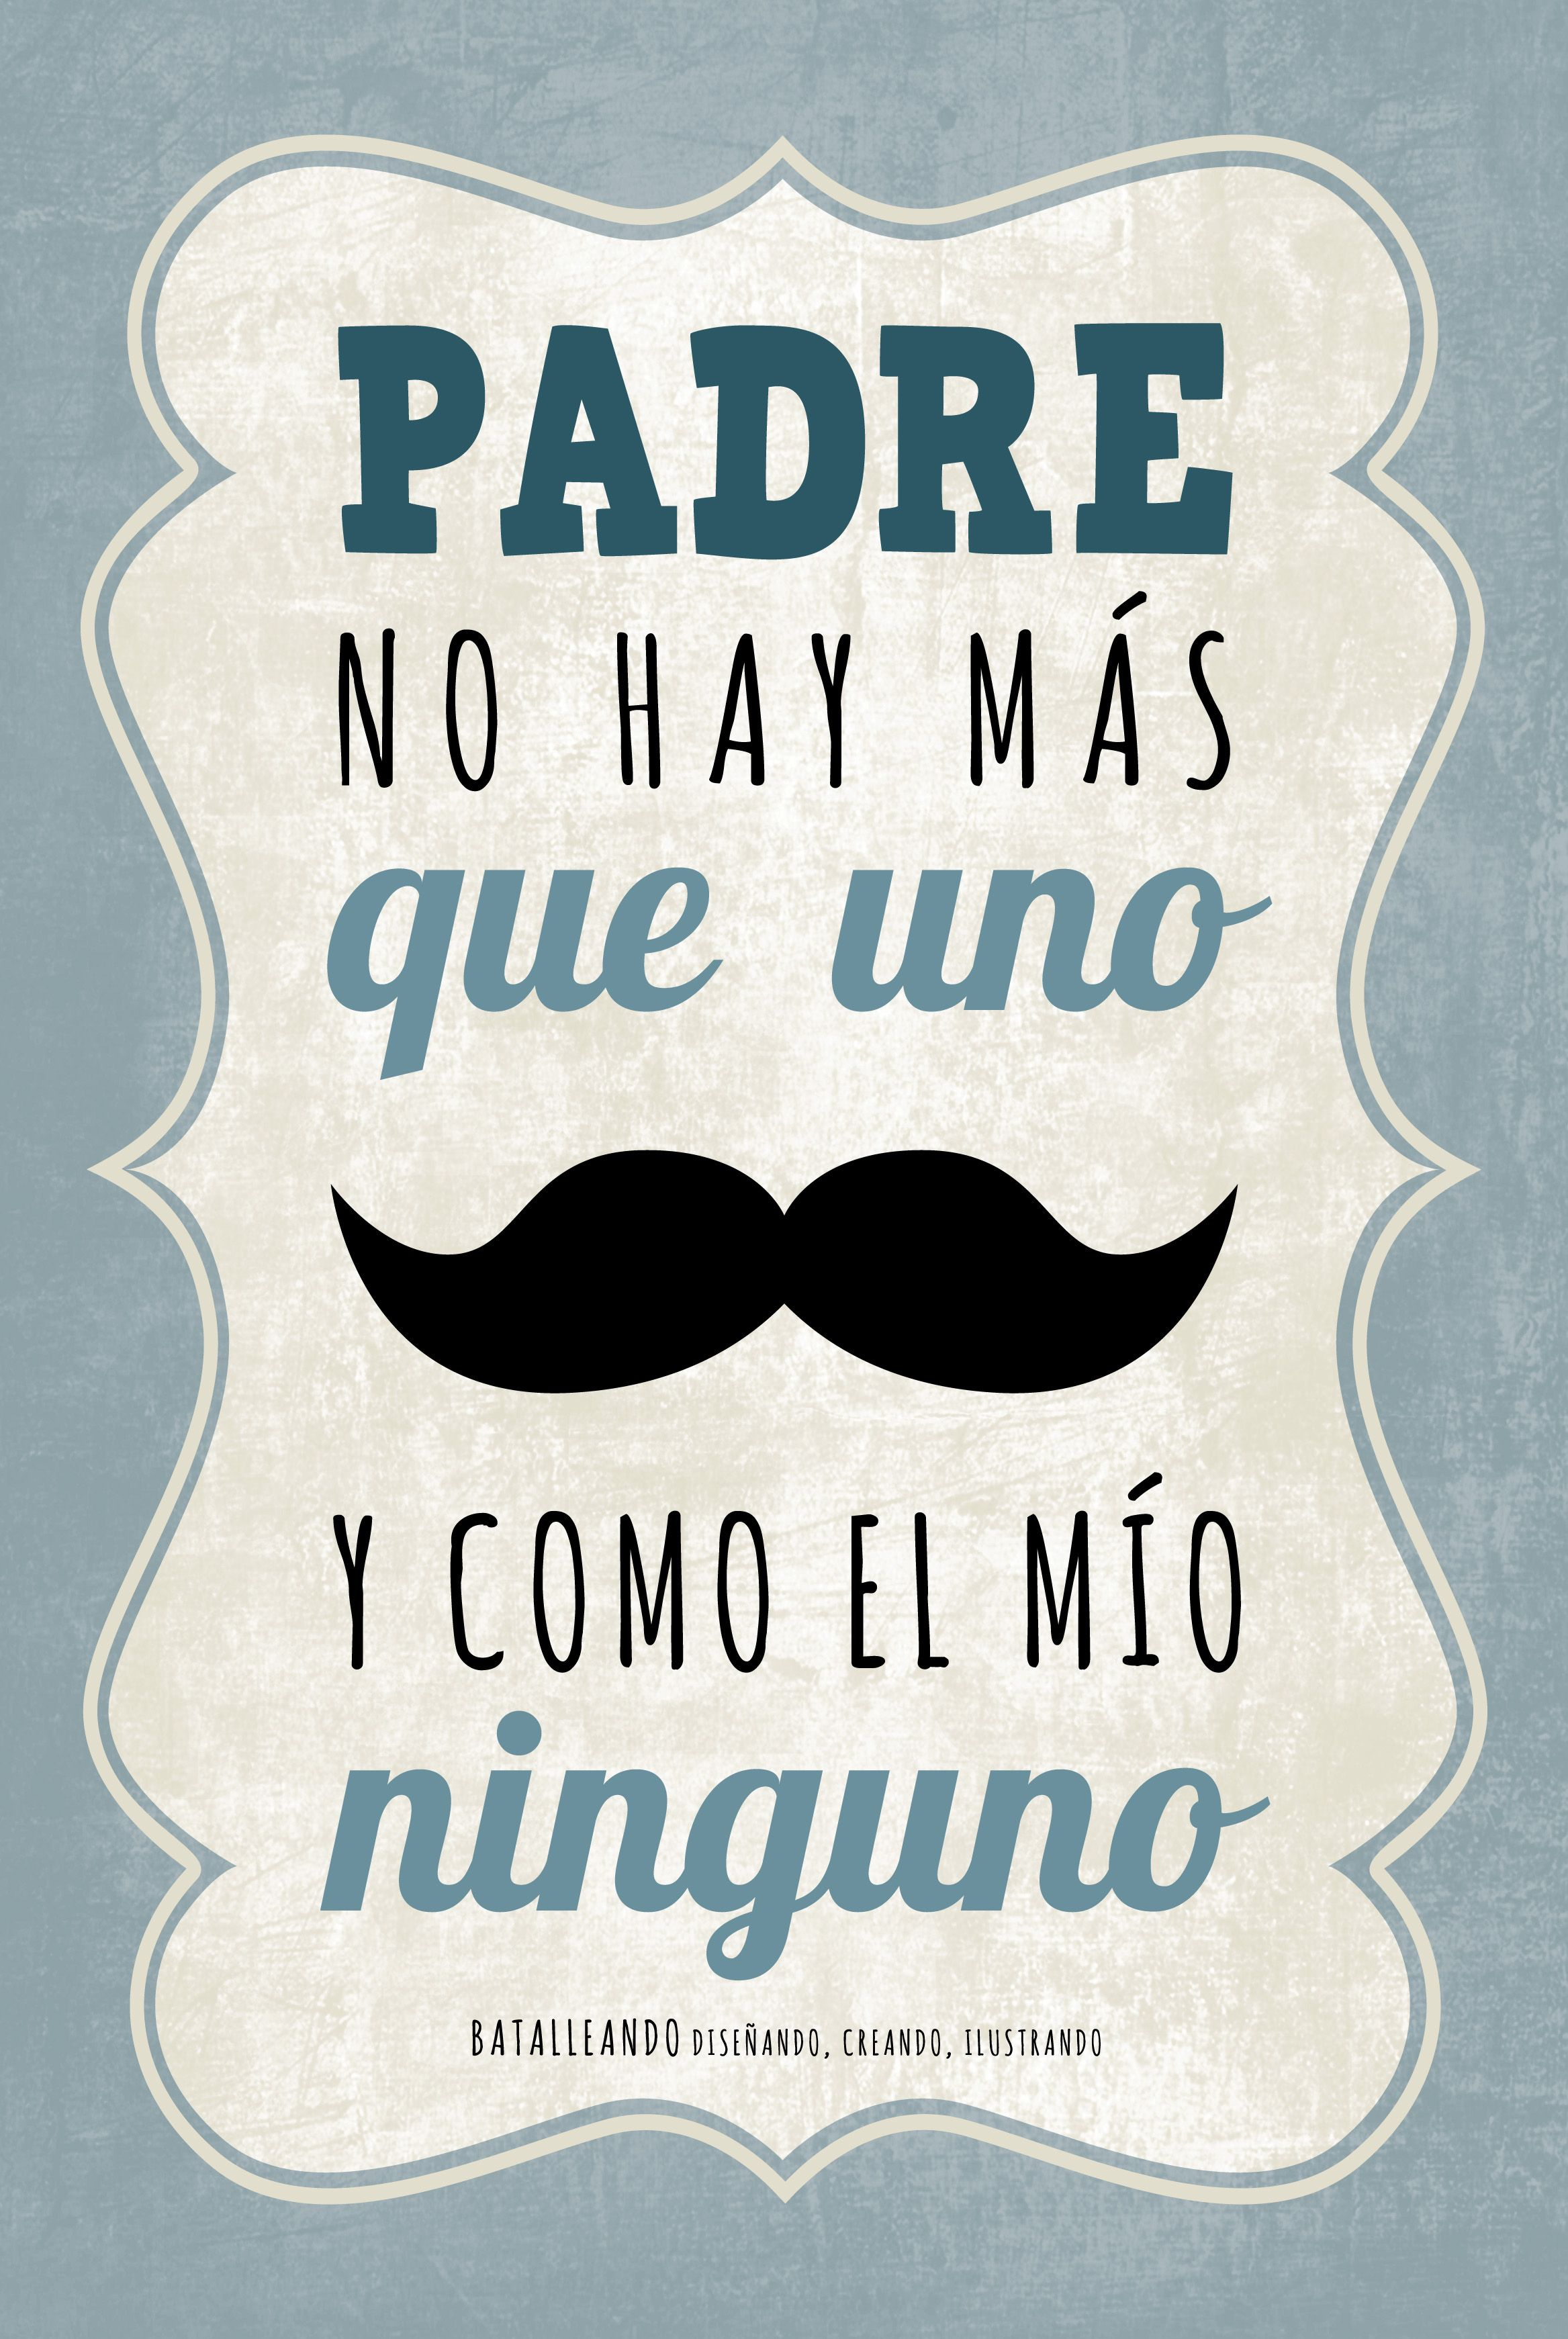 Padre no hay m s que uno frases pizarra pinterest - Mr wonderful dia del padre ...